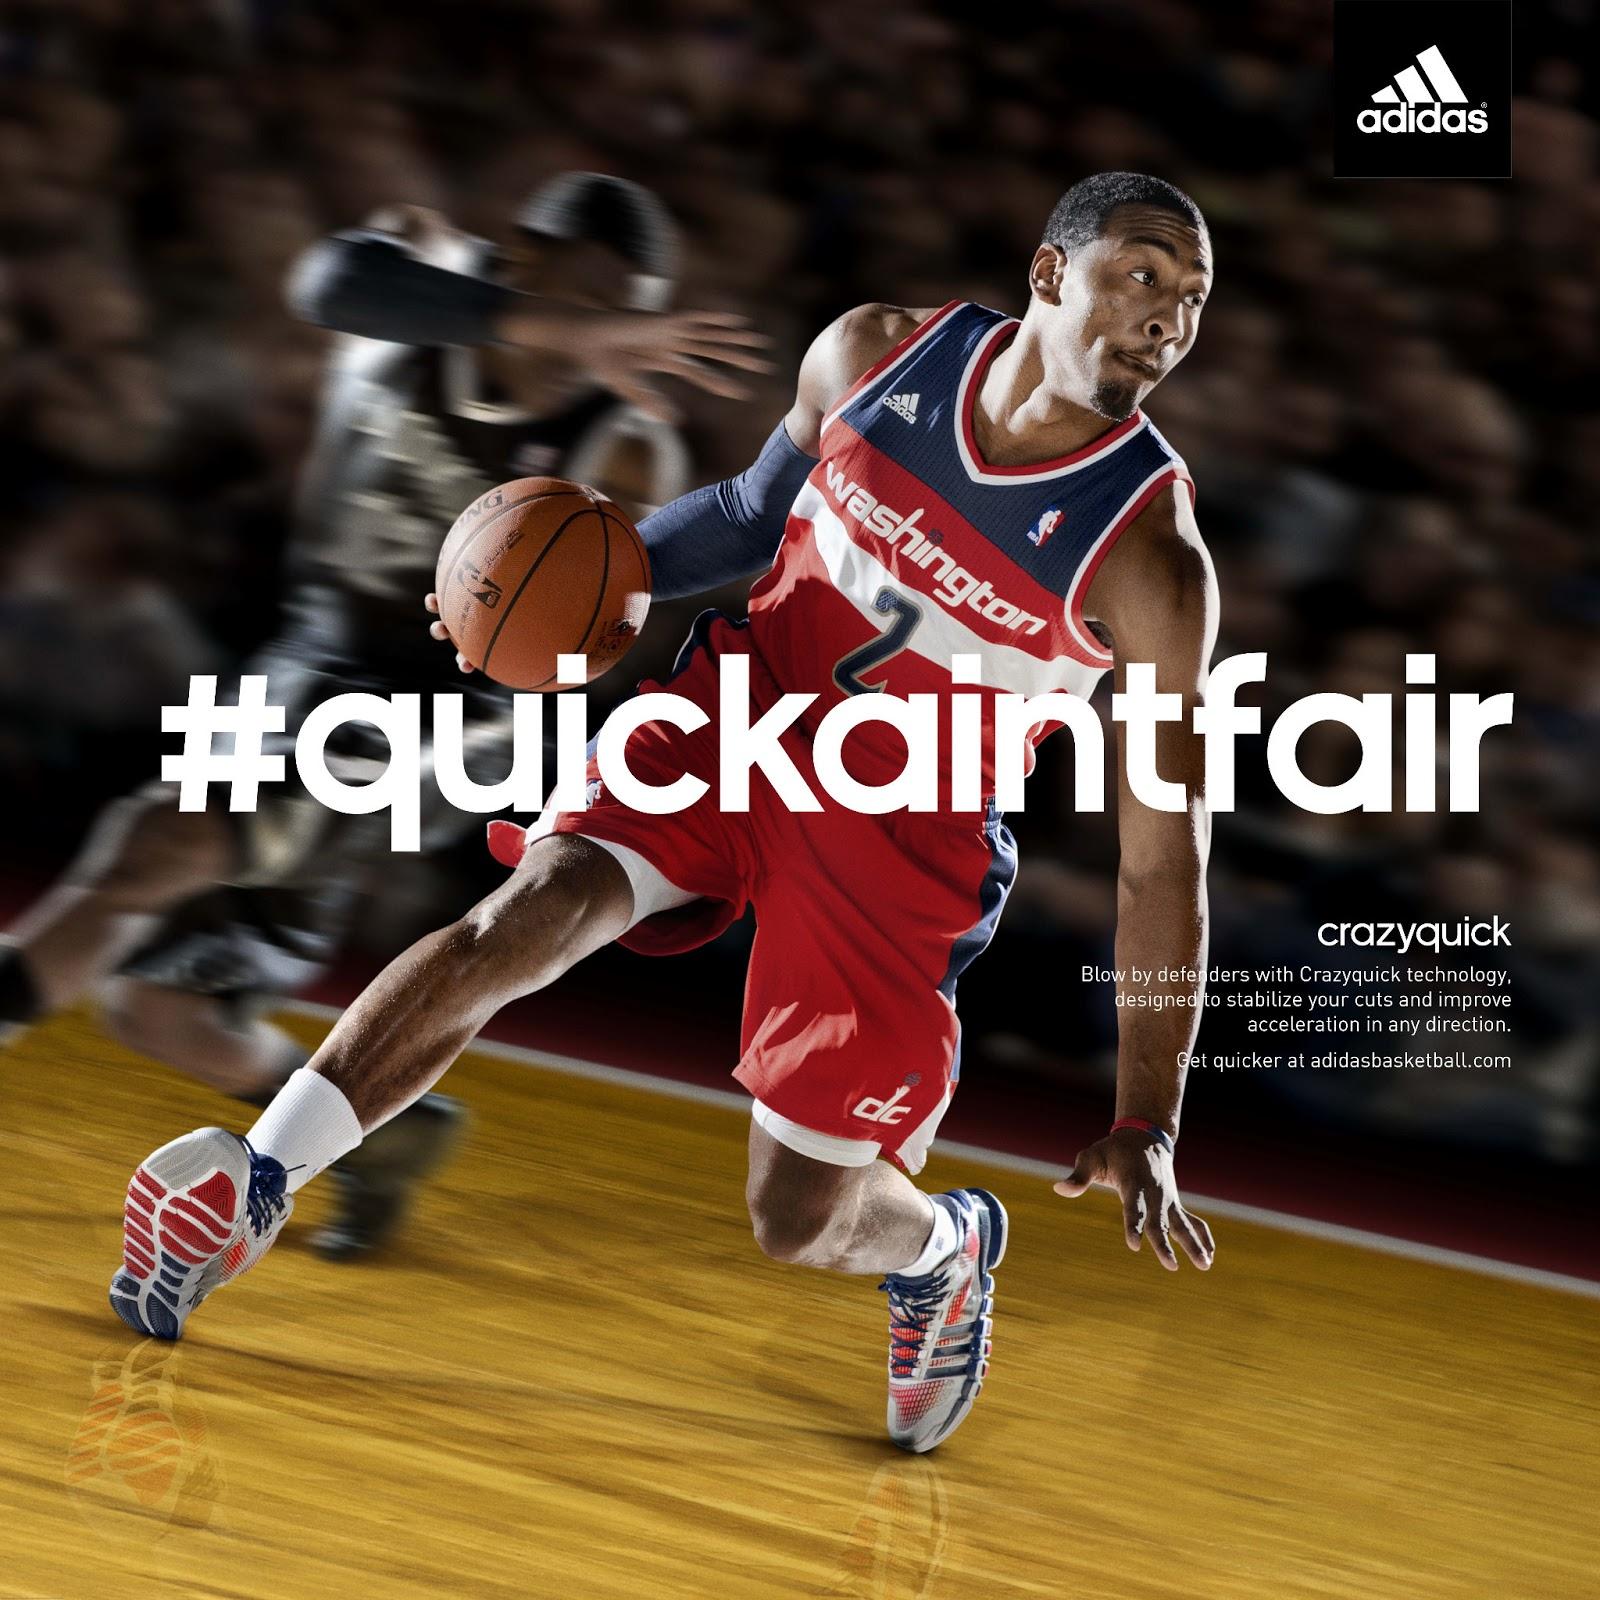 promo code 35cf6 7c06f ADIDAS AND NBA STAR JOHN WALL UNVEIL CRAZYQUICK BASKETBALL SHOE